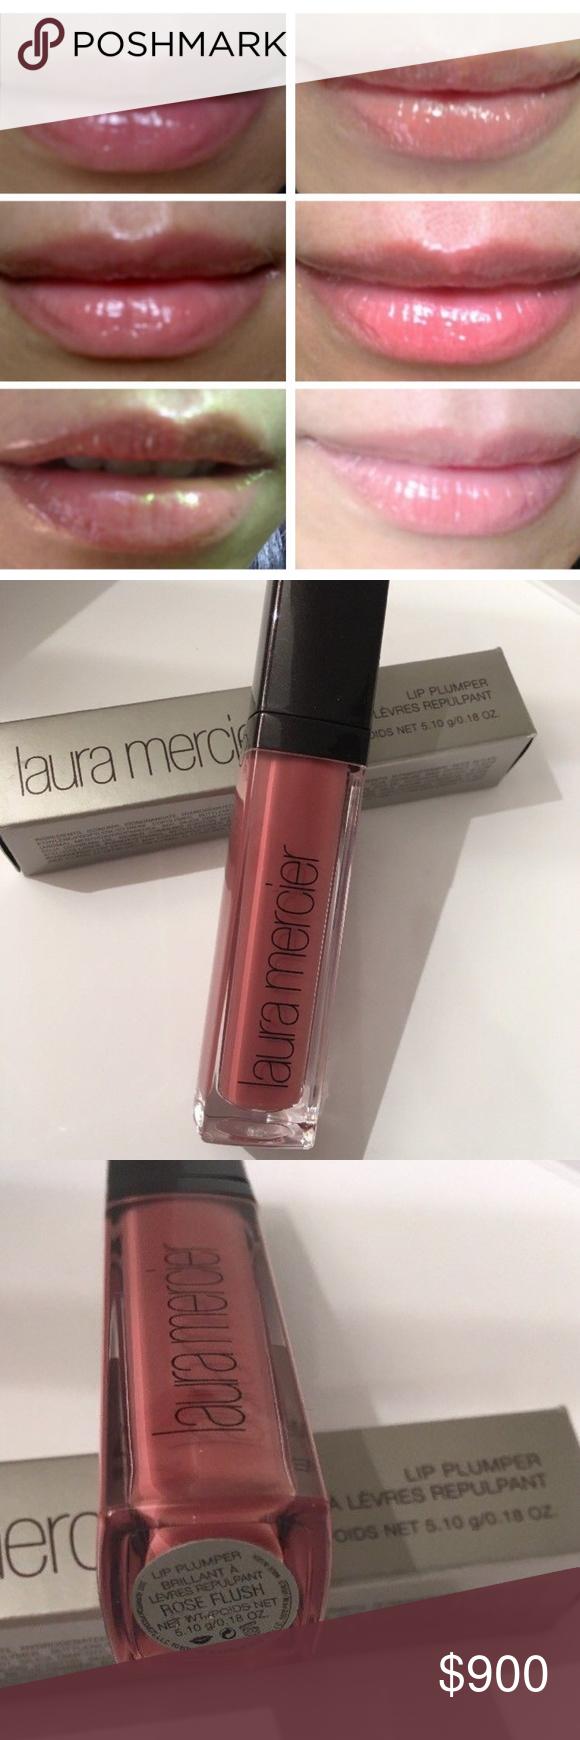 Huge 50pc Lot Laura Mercier Lip Plumpers 2 Colors Laura Mercier Lip Moisturizer Lip Plumper